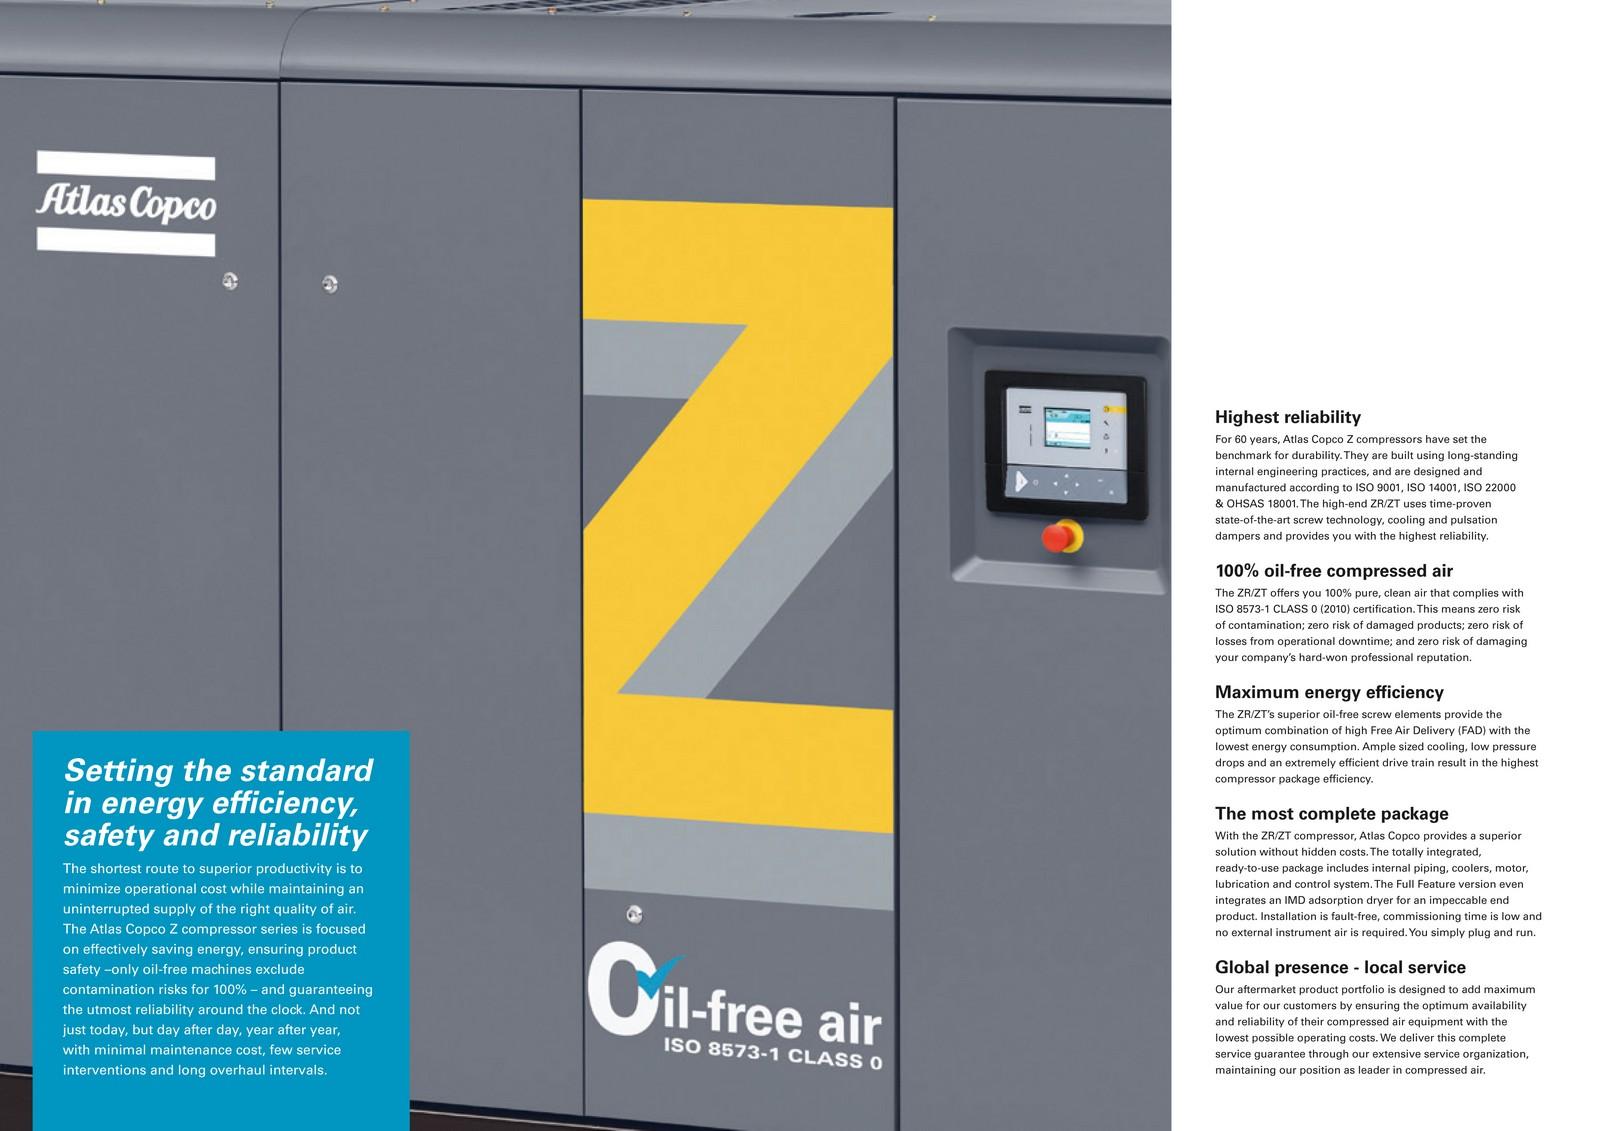 Zr Zt 110 900 Oil Free Compressed Air Equipment Atlas Copco 1600 Wiring Diagram Power Plants